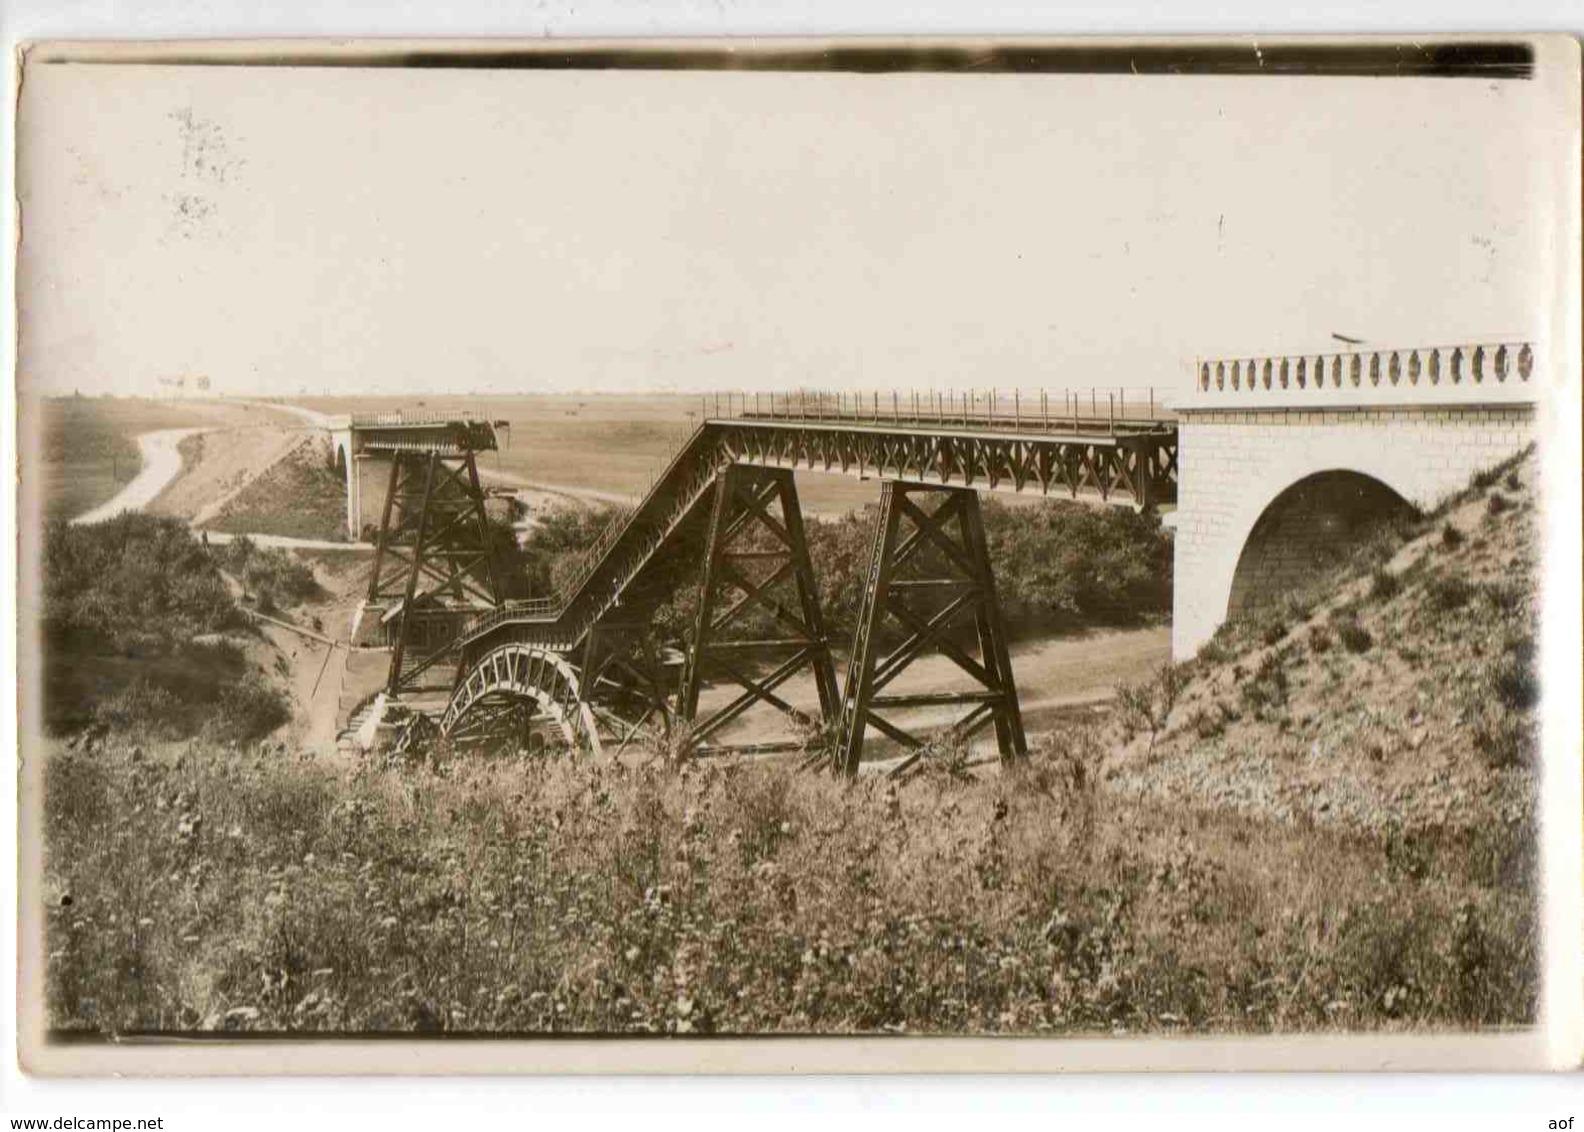 54-2411 BOUILLONVILLE Pont Grande Photo - France